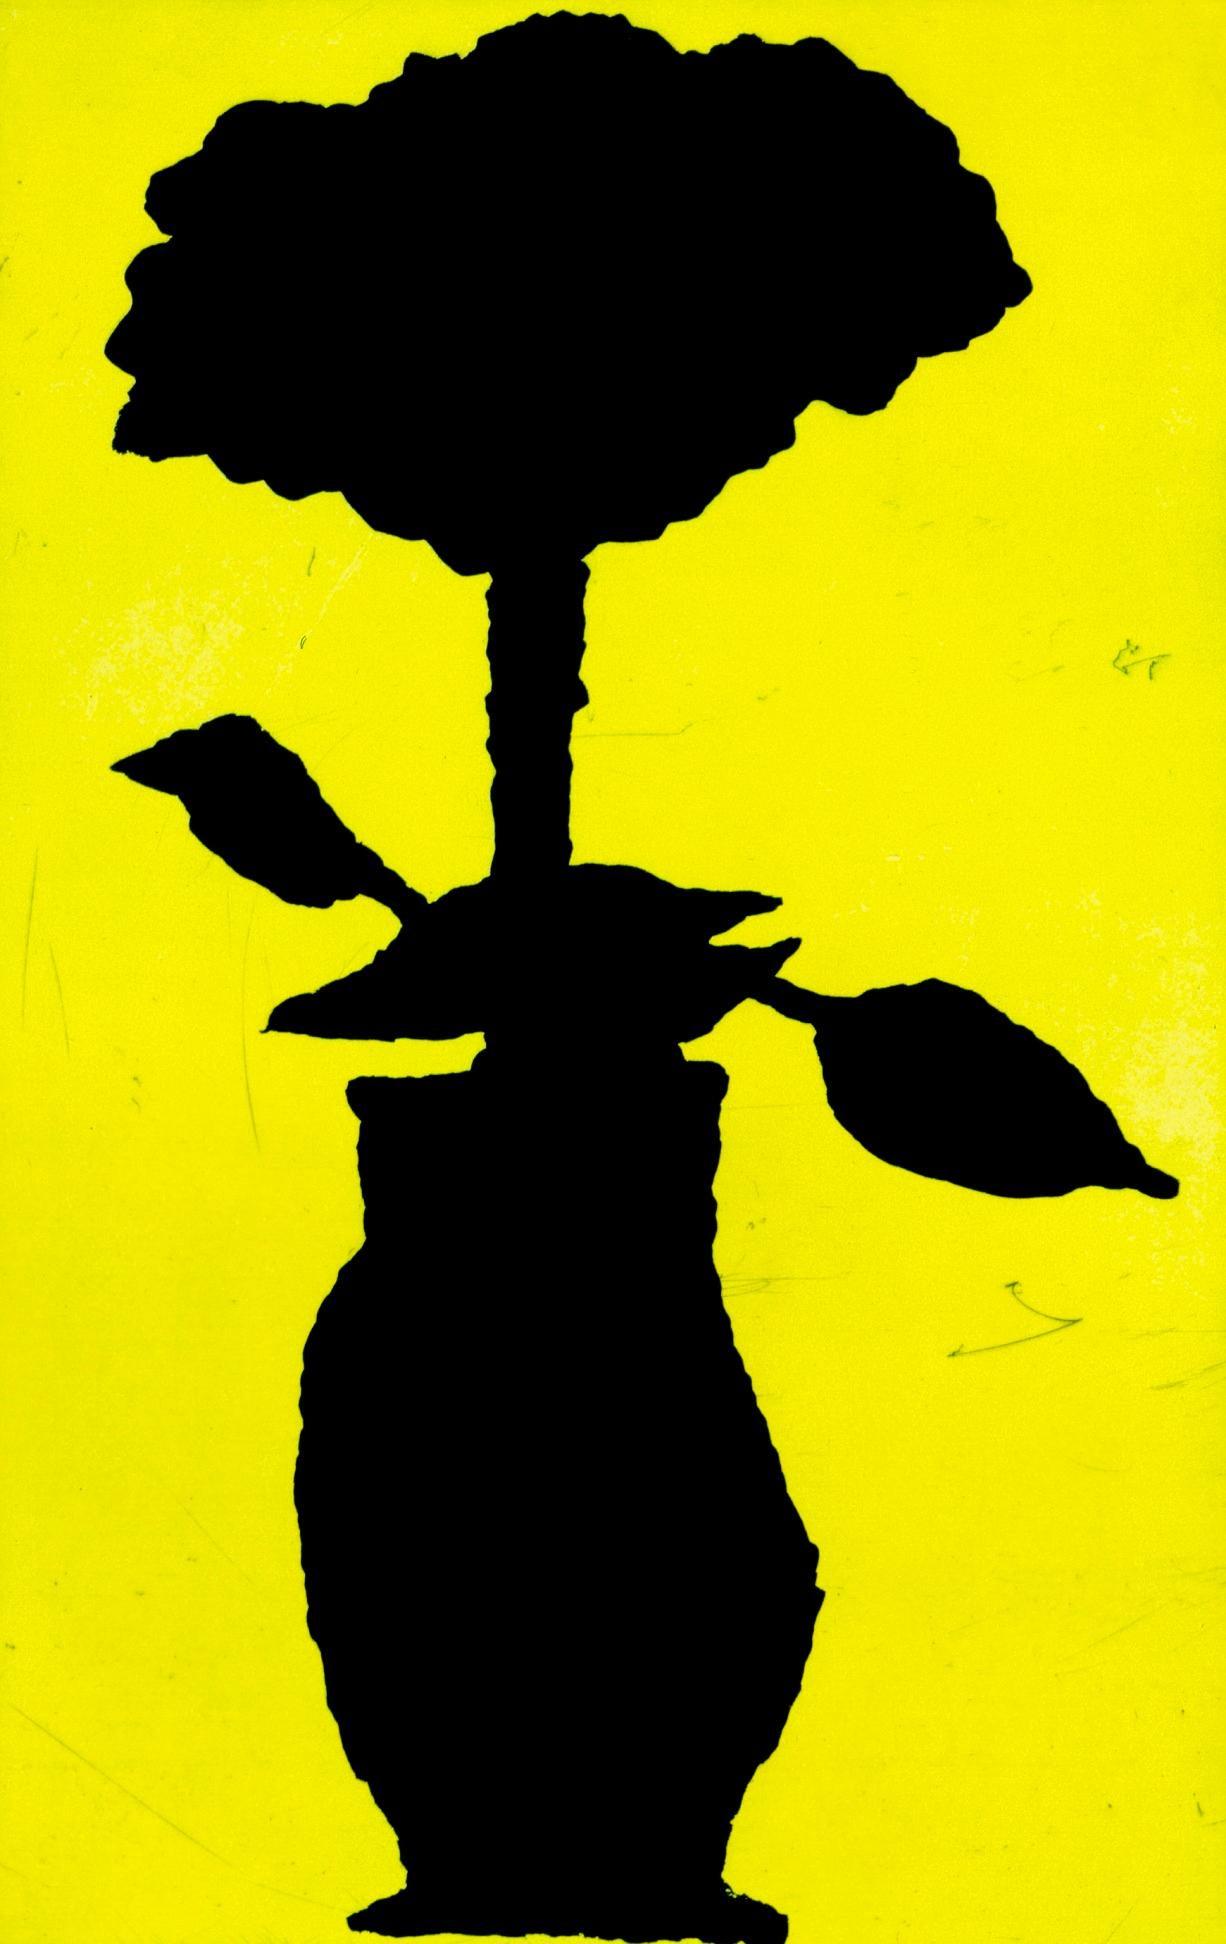 Donald Baechler Flower 2005 (Donald Baechler flower prints)